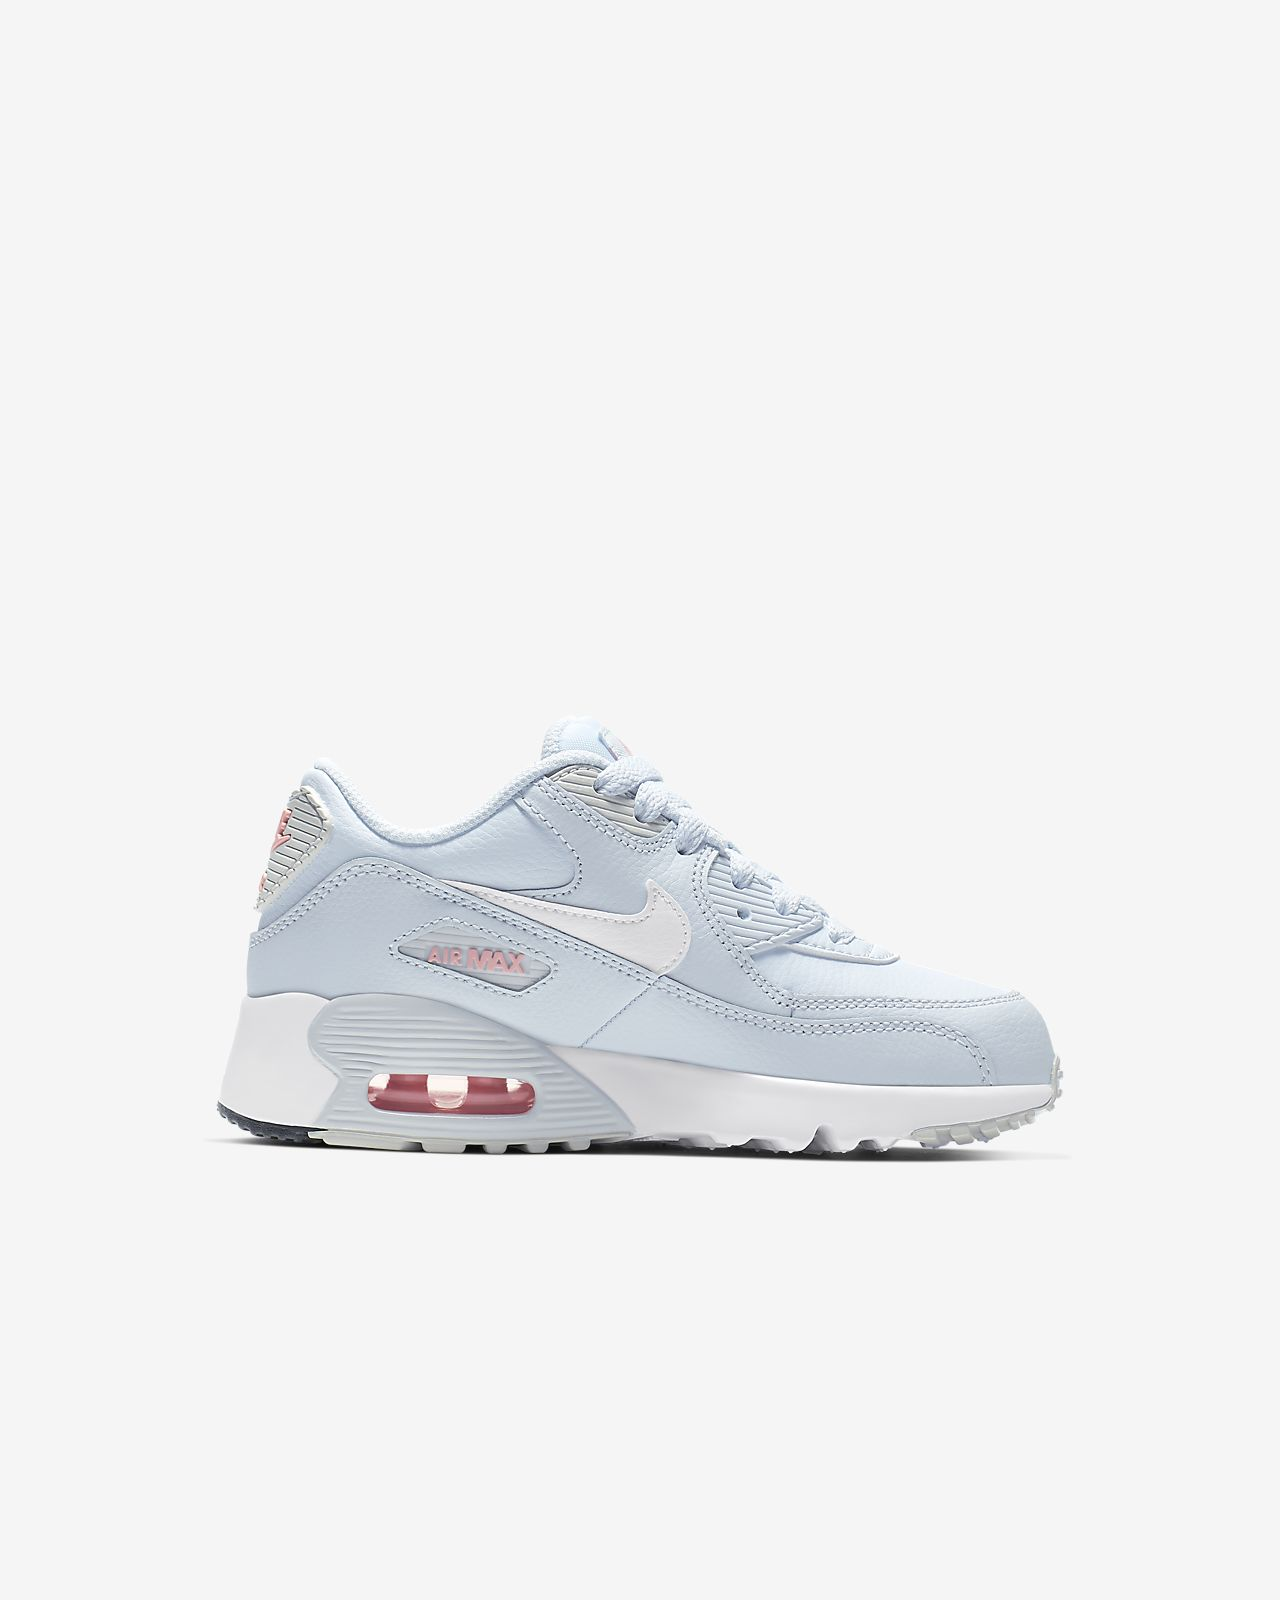 593344a2b7d2 Nike Air Max 90 Leather Little Kids  Shoe. Nike.com